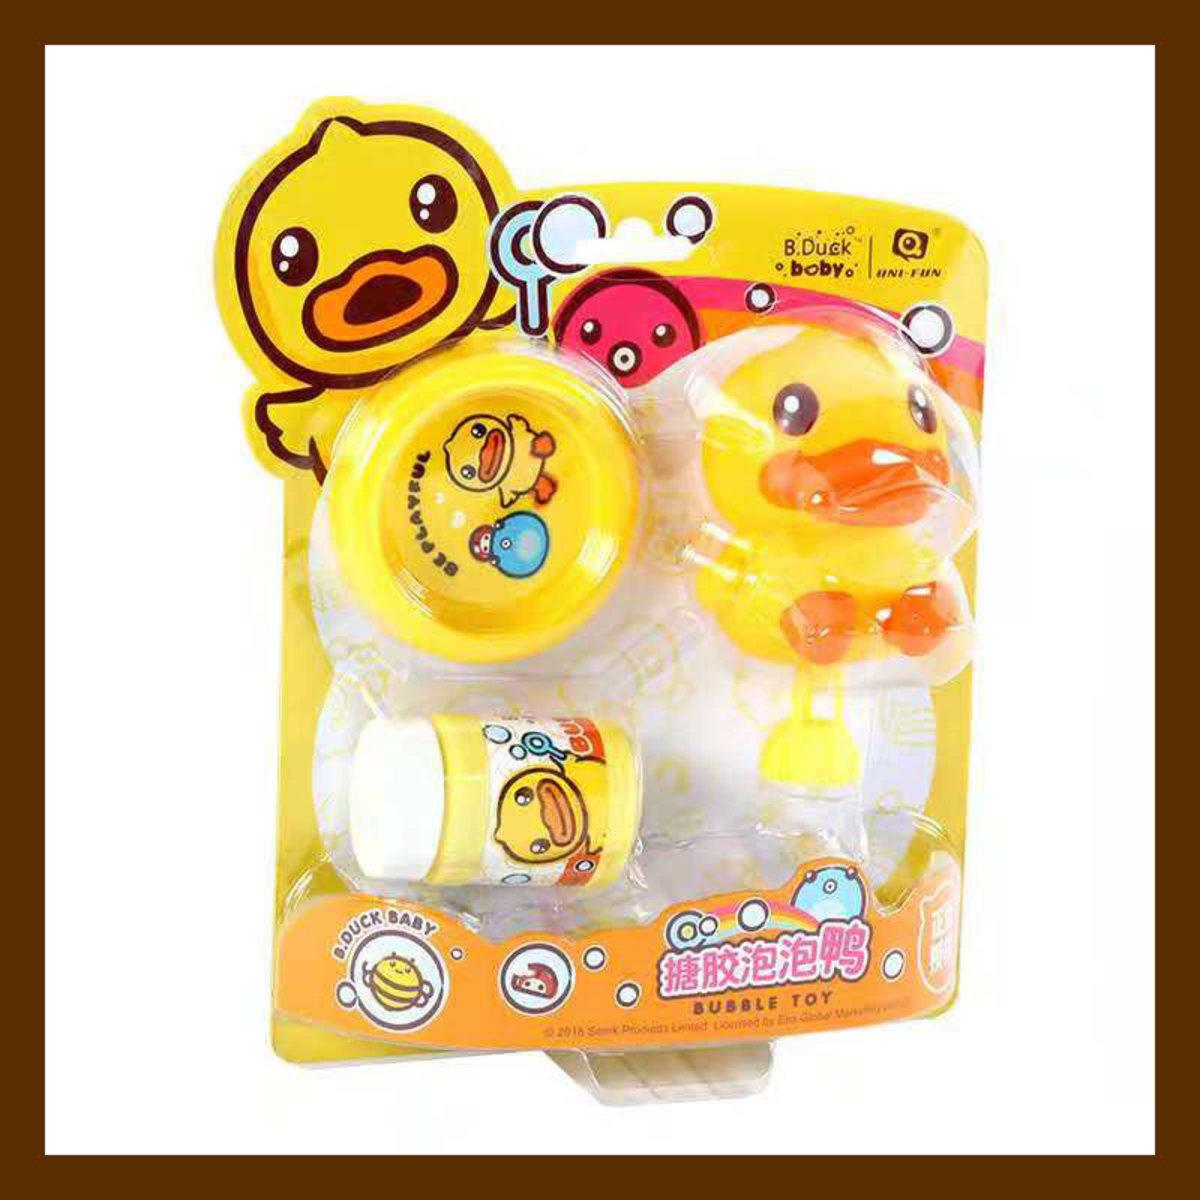 B Duck Bubble Toy(6971266380134)